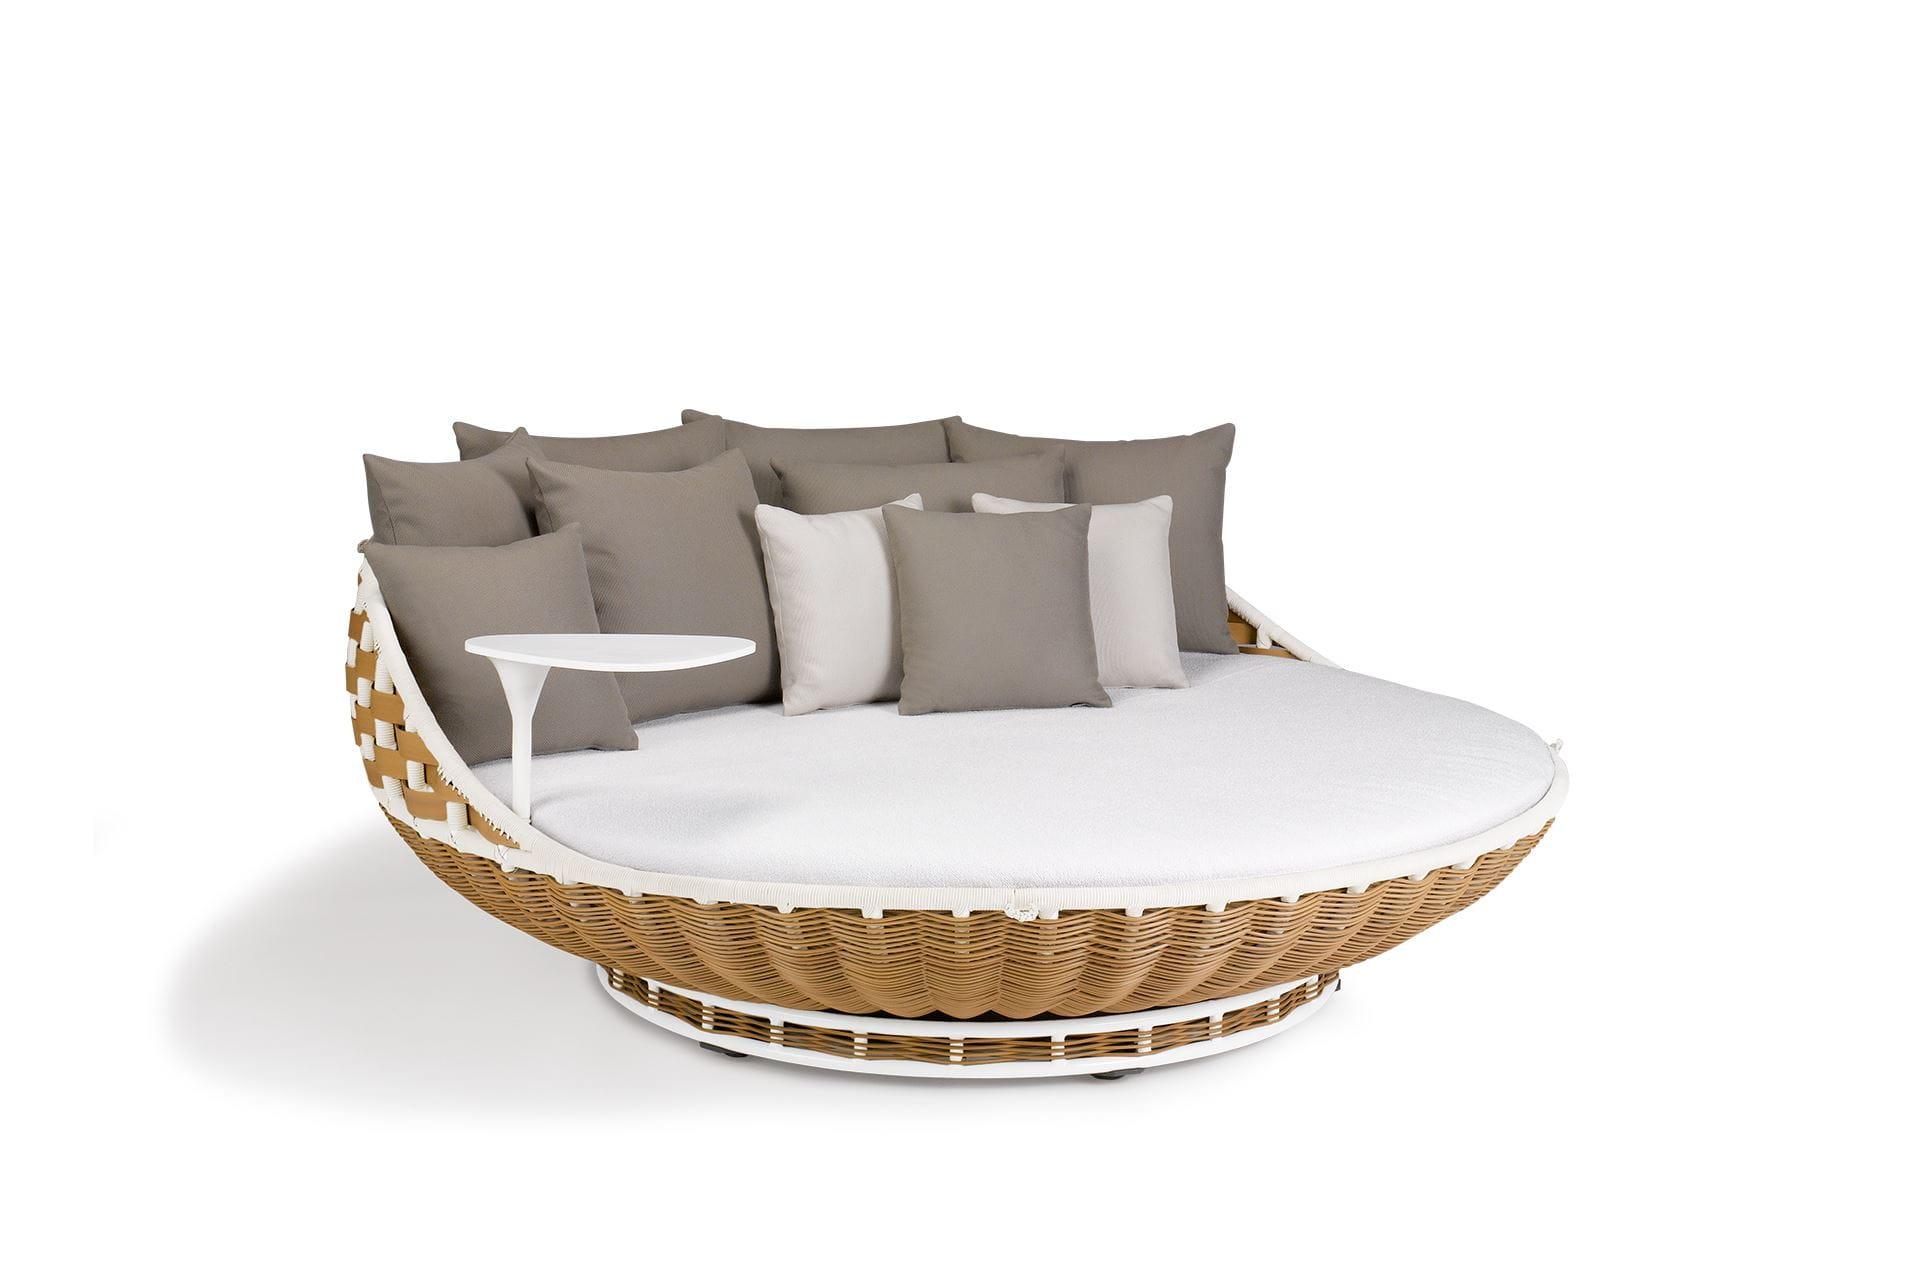 Groovy Dedon Swingrest Swingme Machost Co Dining Chair Design Ideas Machostcouk